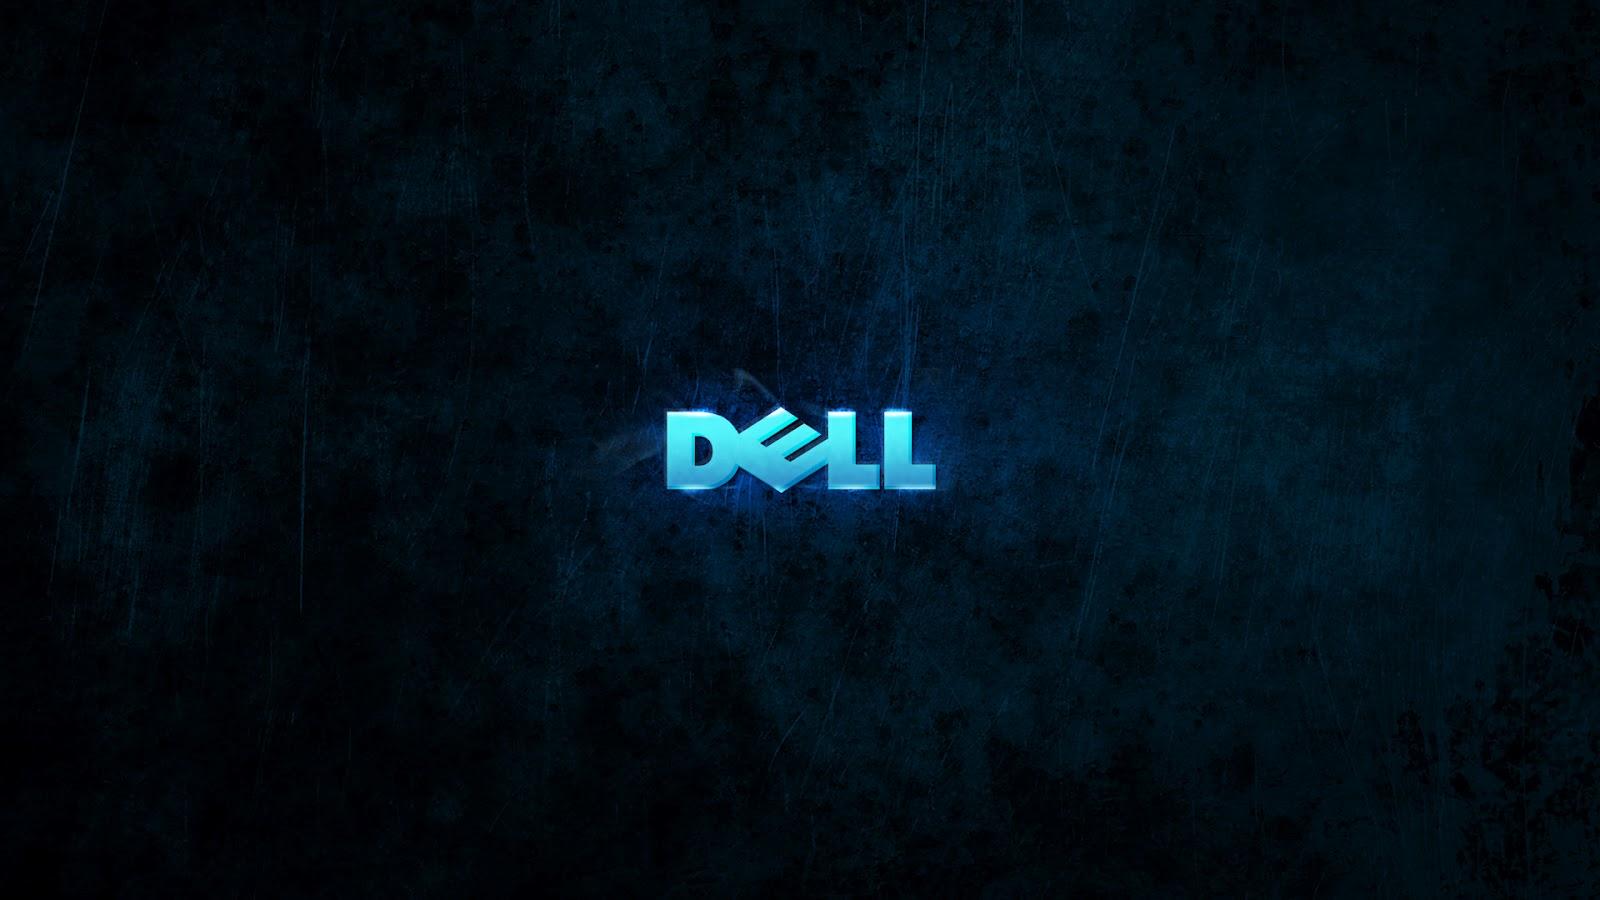 Dell HD Wallpaper 1920x1080 ~ HD Wallpaper